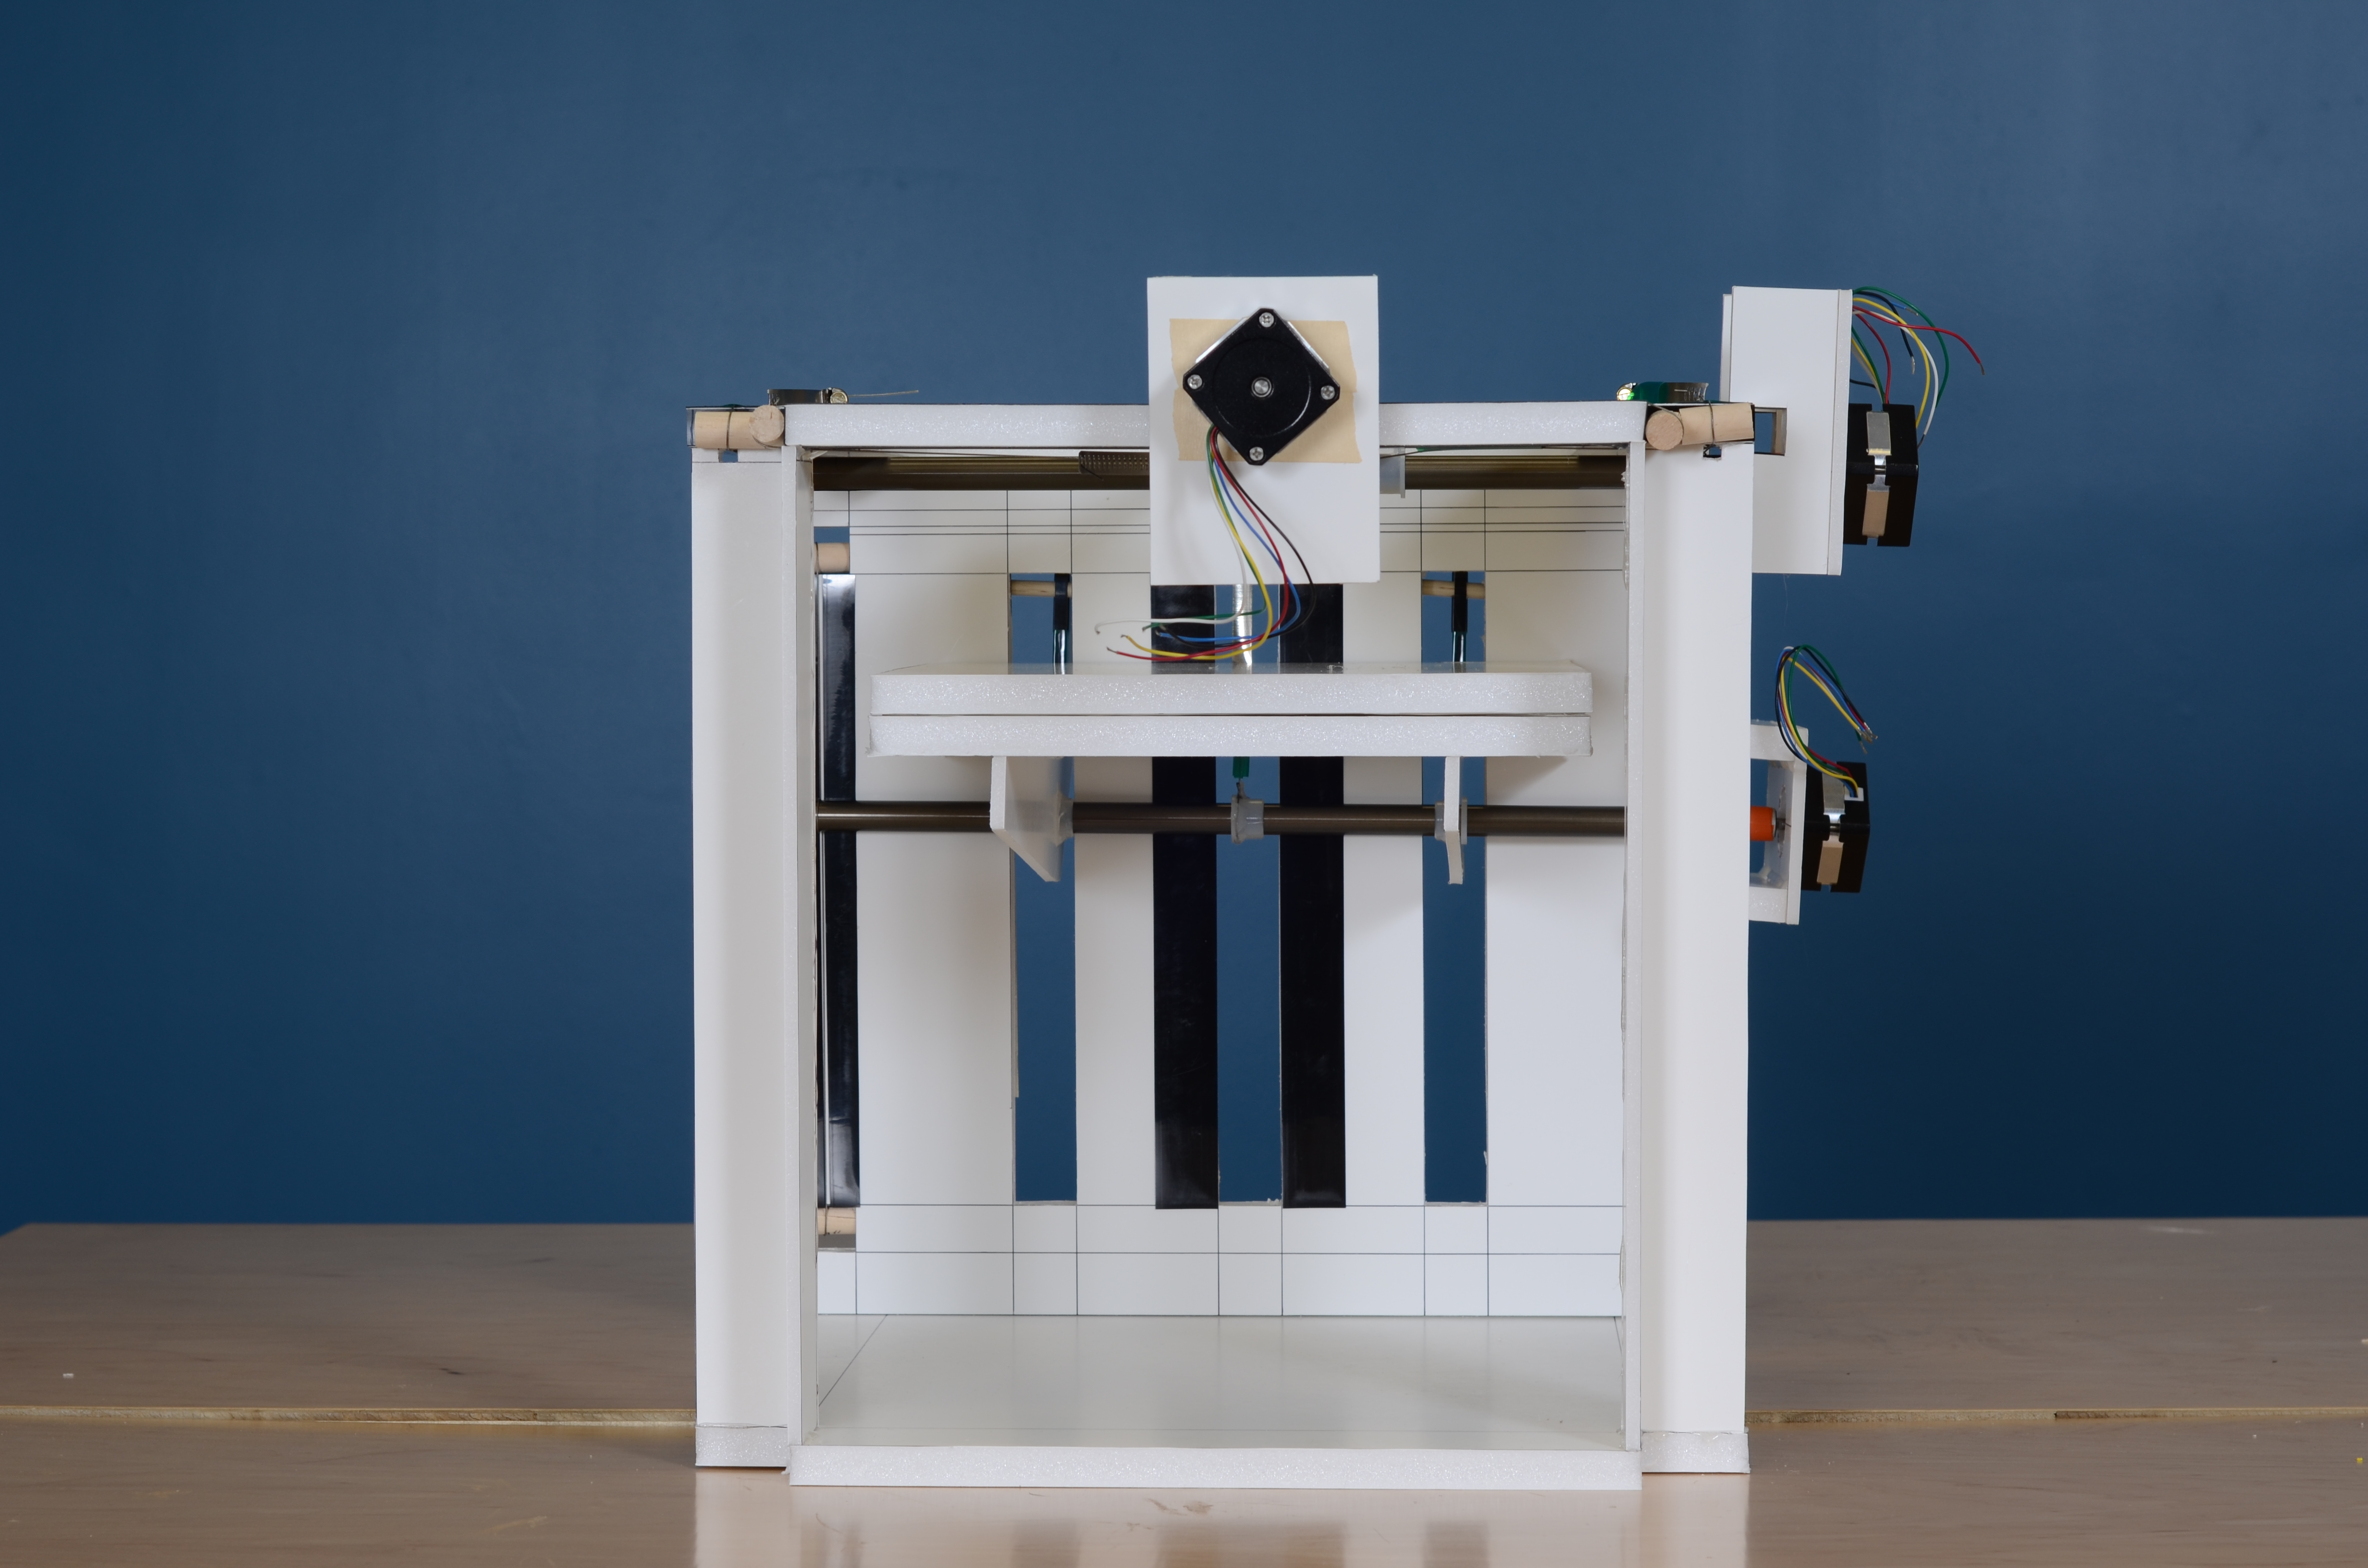 Picture of Build a Foamcore CNC Machine